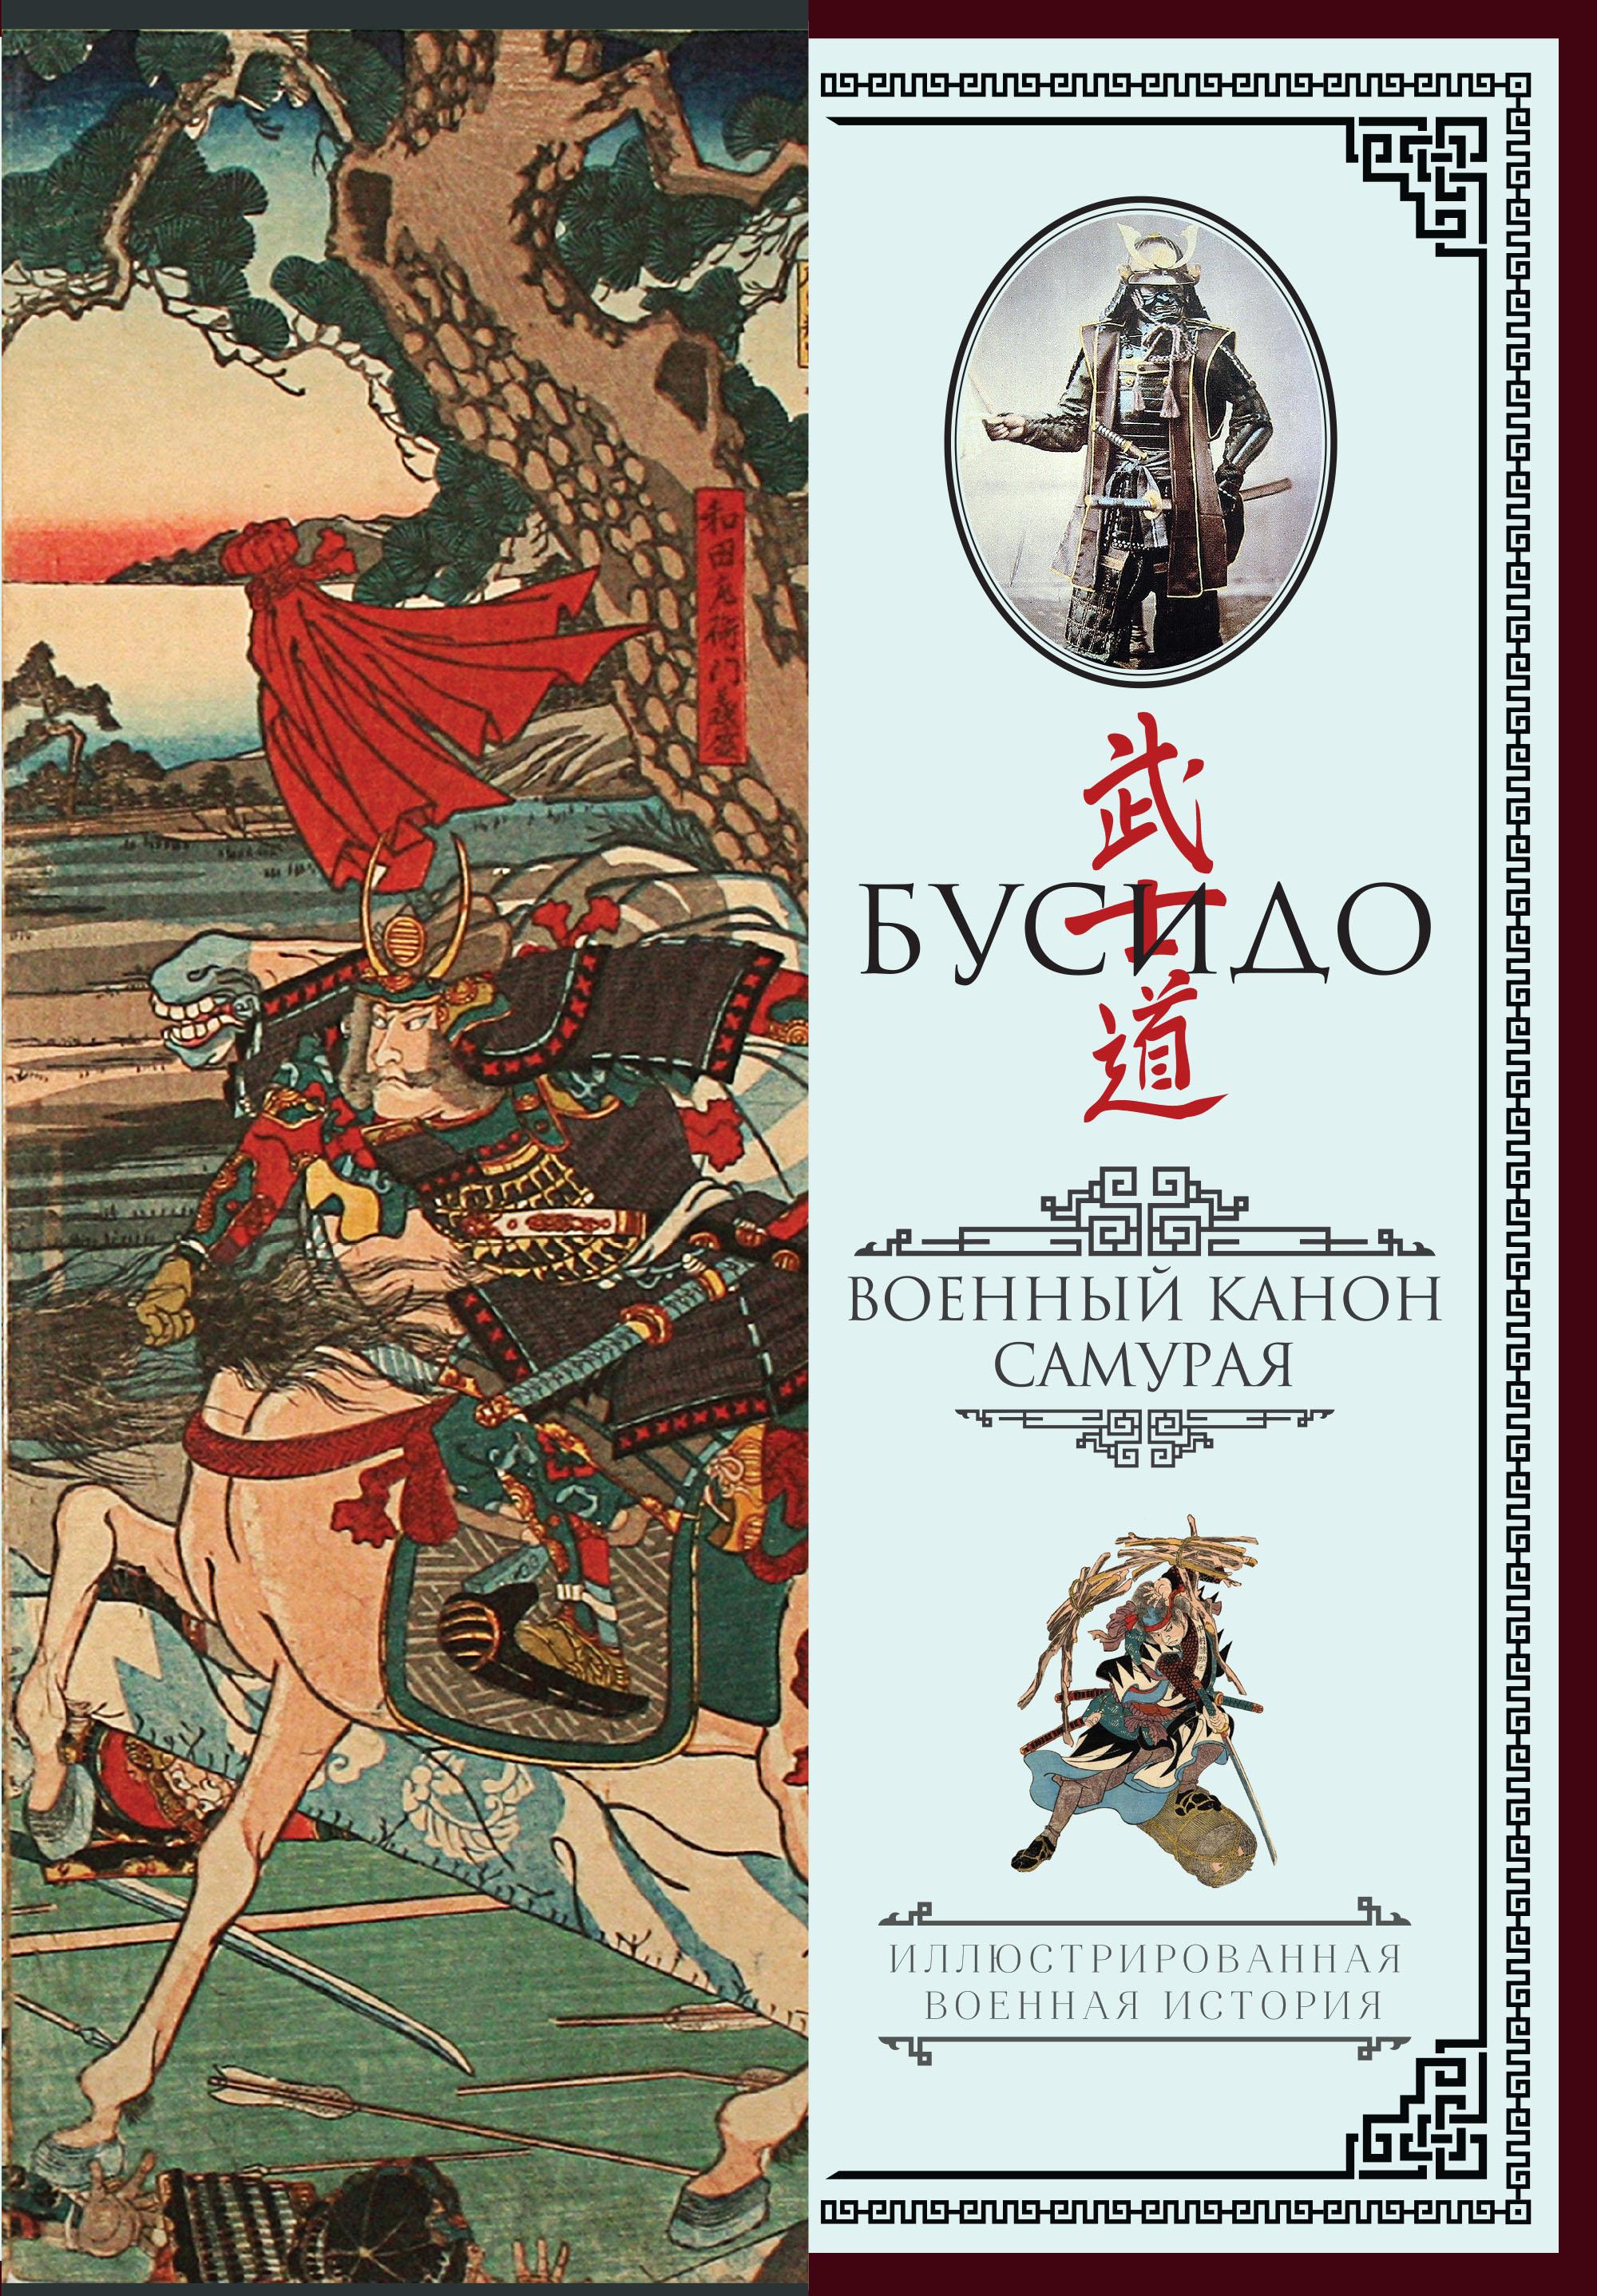 Ямамото Цунэтомо Бусидо. Военный канон самурая с комментариями дайдодзи ю цунэтомо я мусаси м и др бусидо военный канон самурая с комментариями